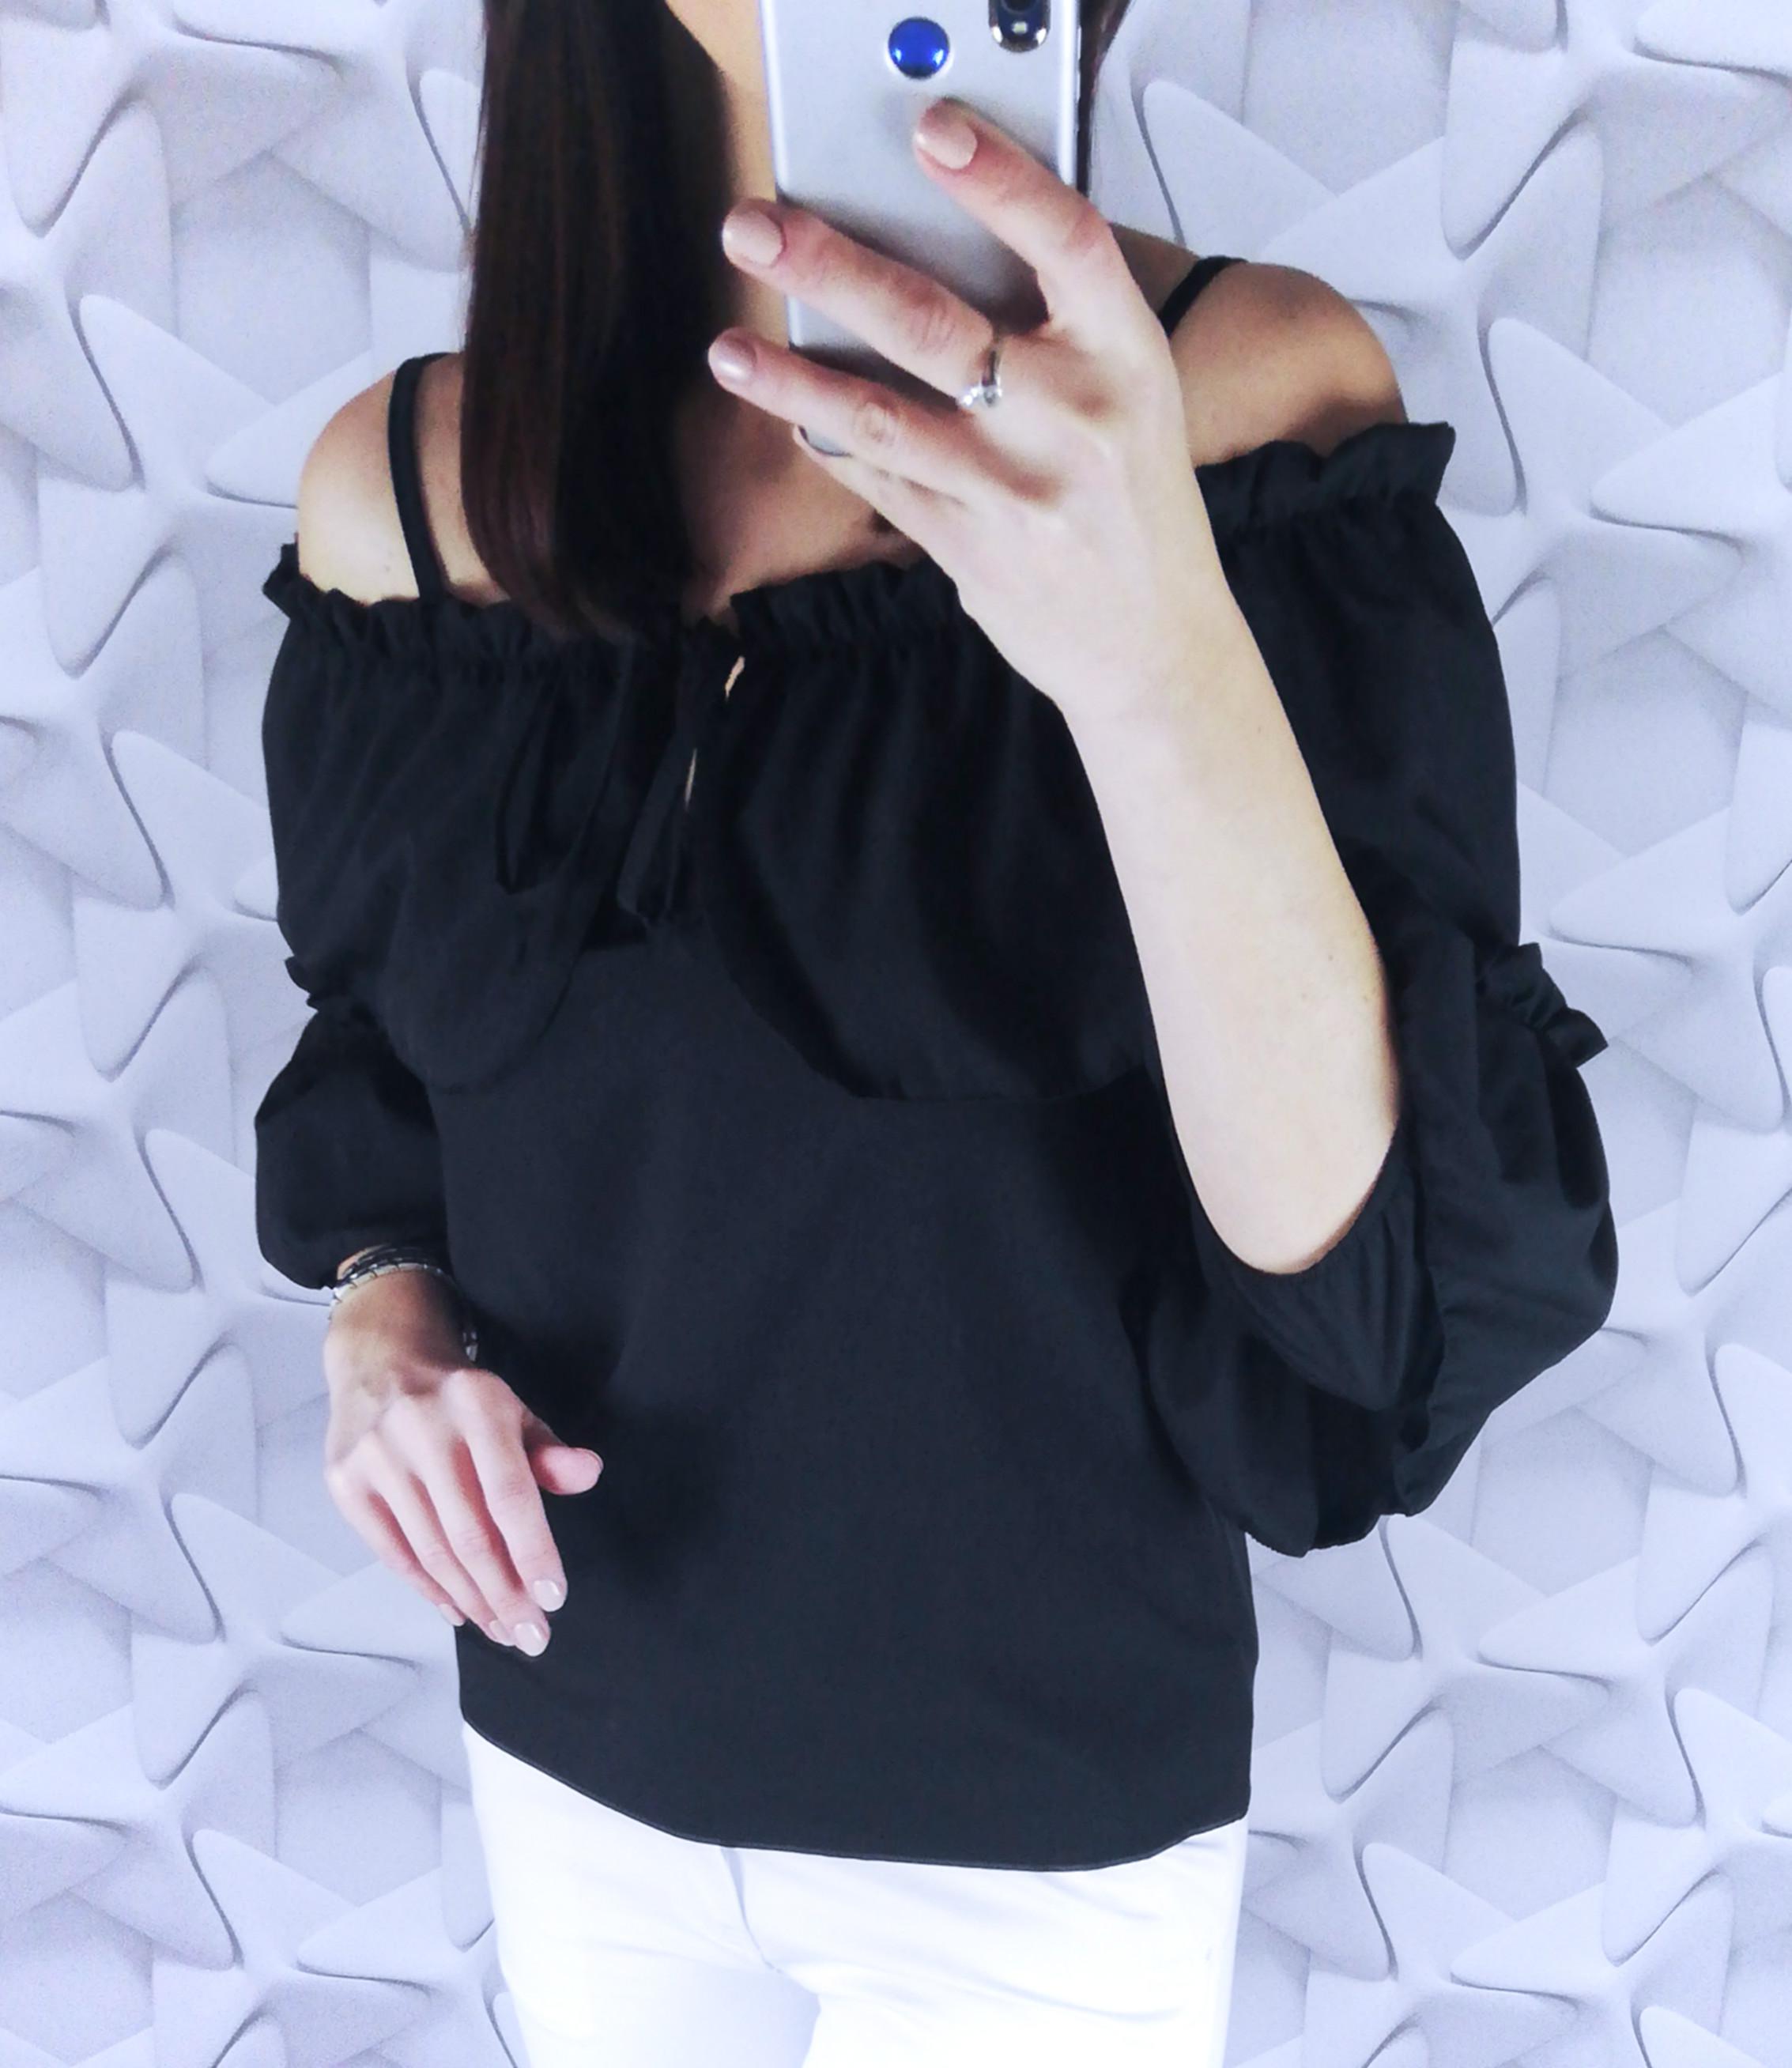 dámsky top,dámska blúzka, elegantná dámska blúzka, blúzka s mašľou,biela blúzka,čierna blúzka s odhalenymi ramenami